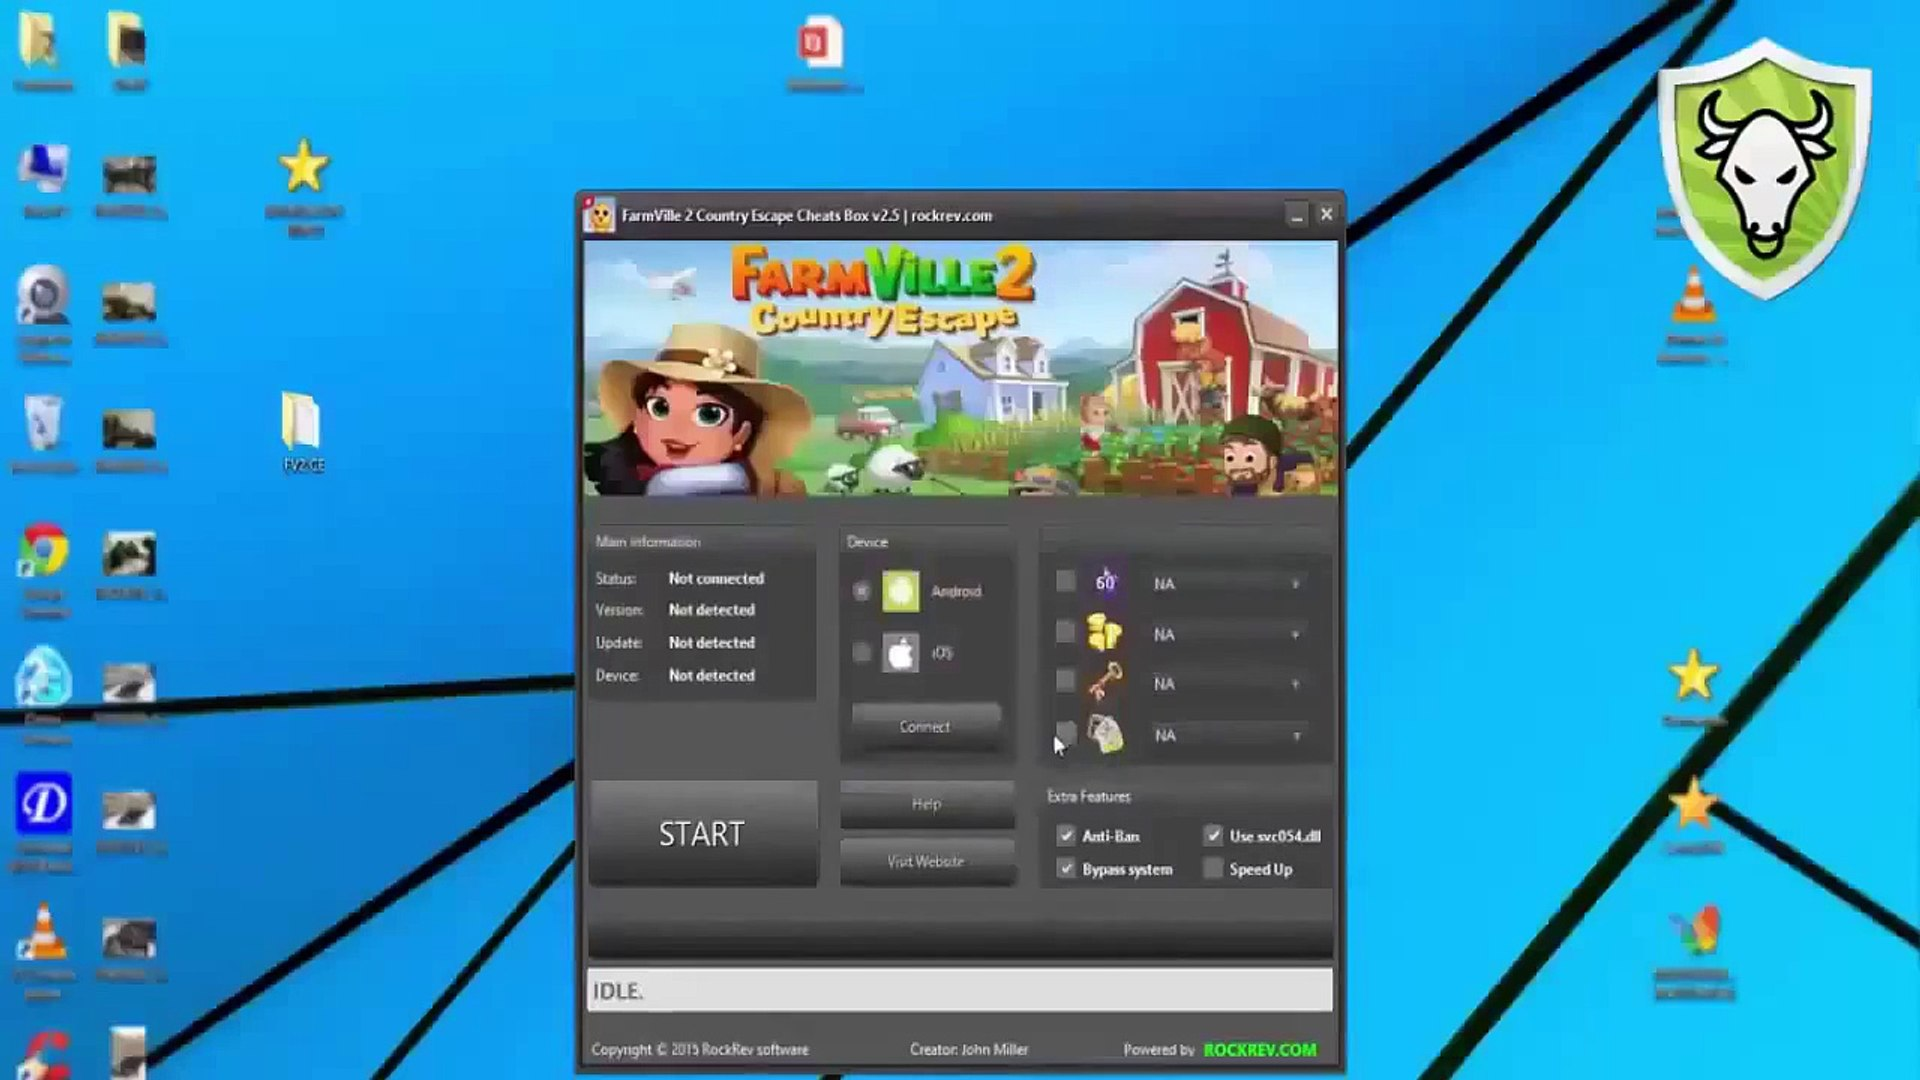 HD FarmVille 2 Country Escape Hack Tool No Survey - video Dailymotion